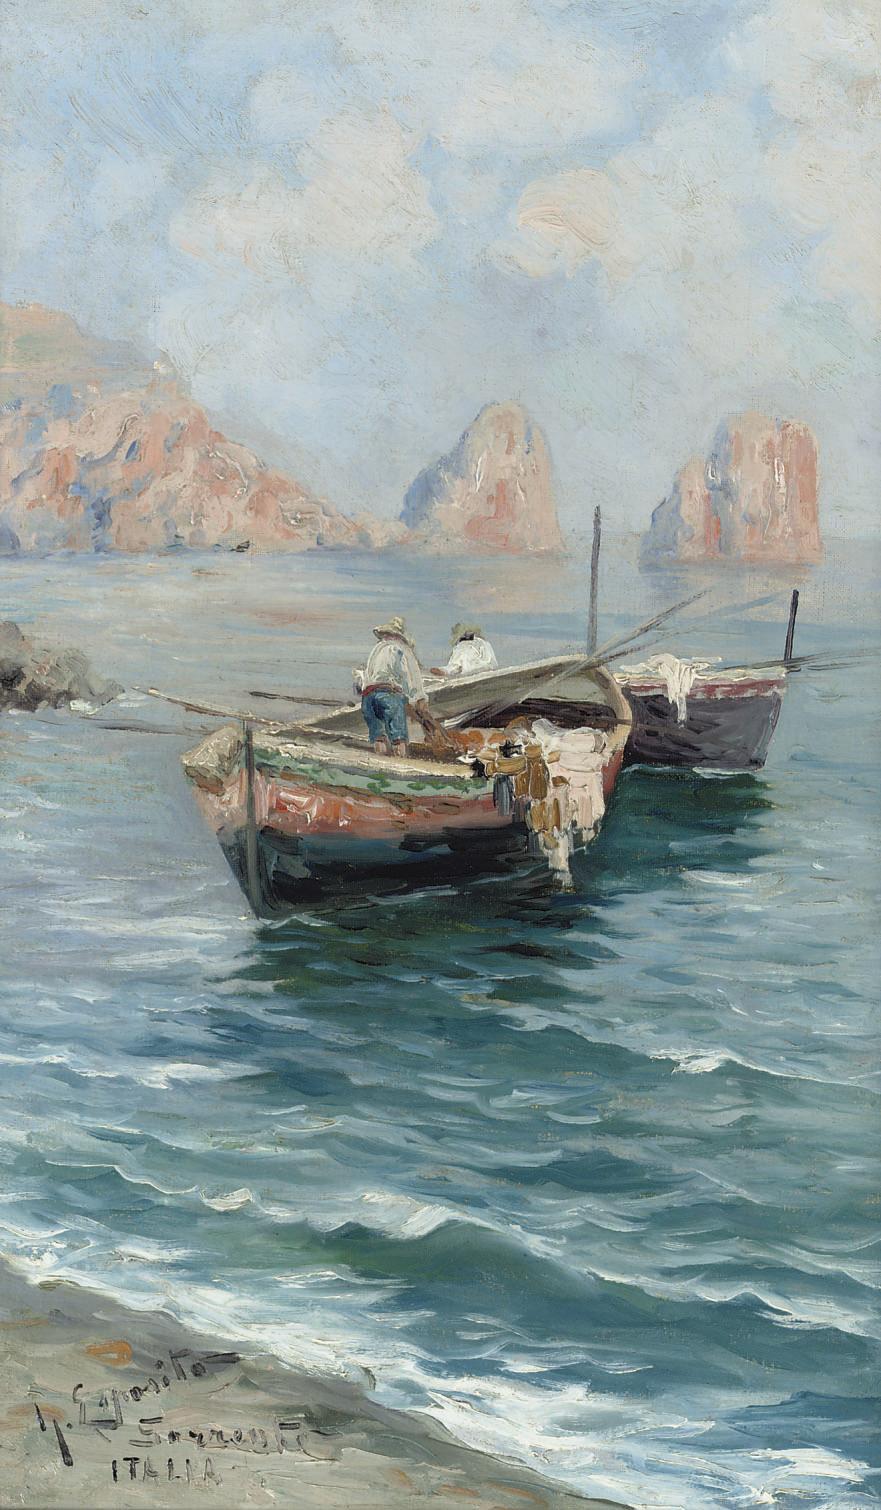 Sorrento, Italia: fishing boats in the bay of Naples